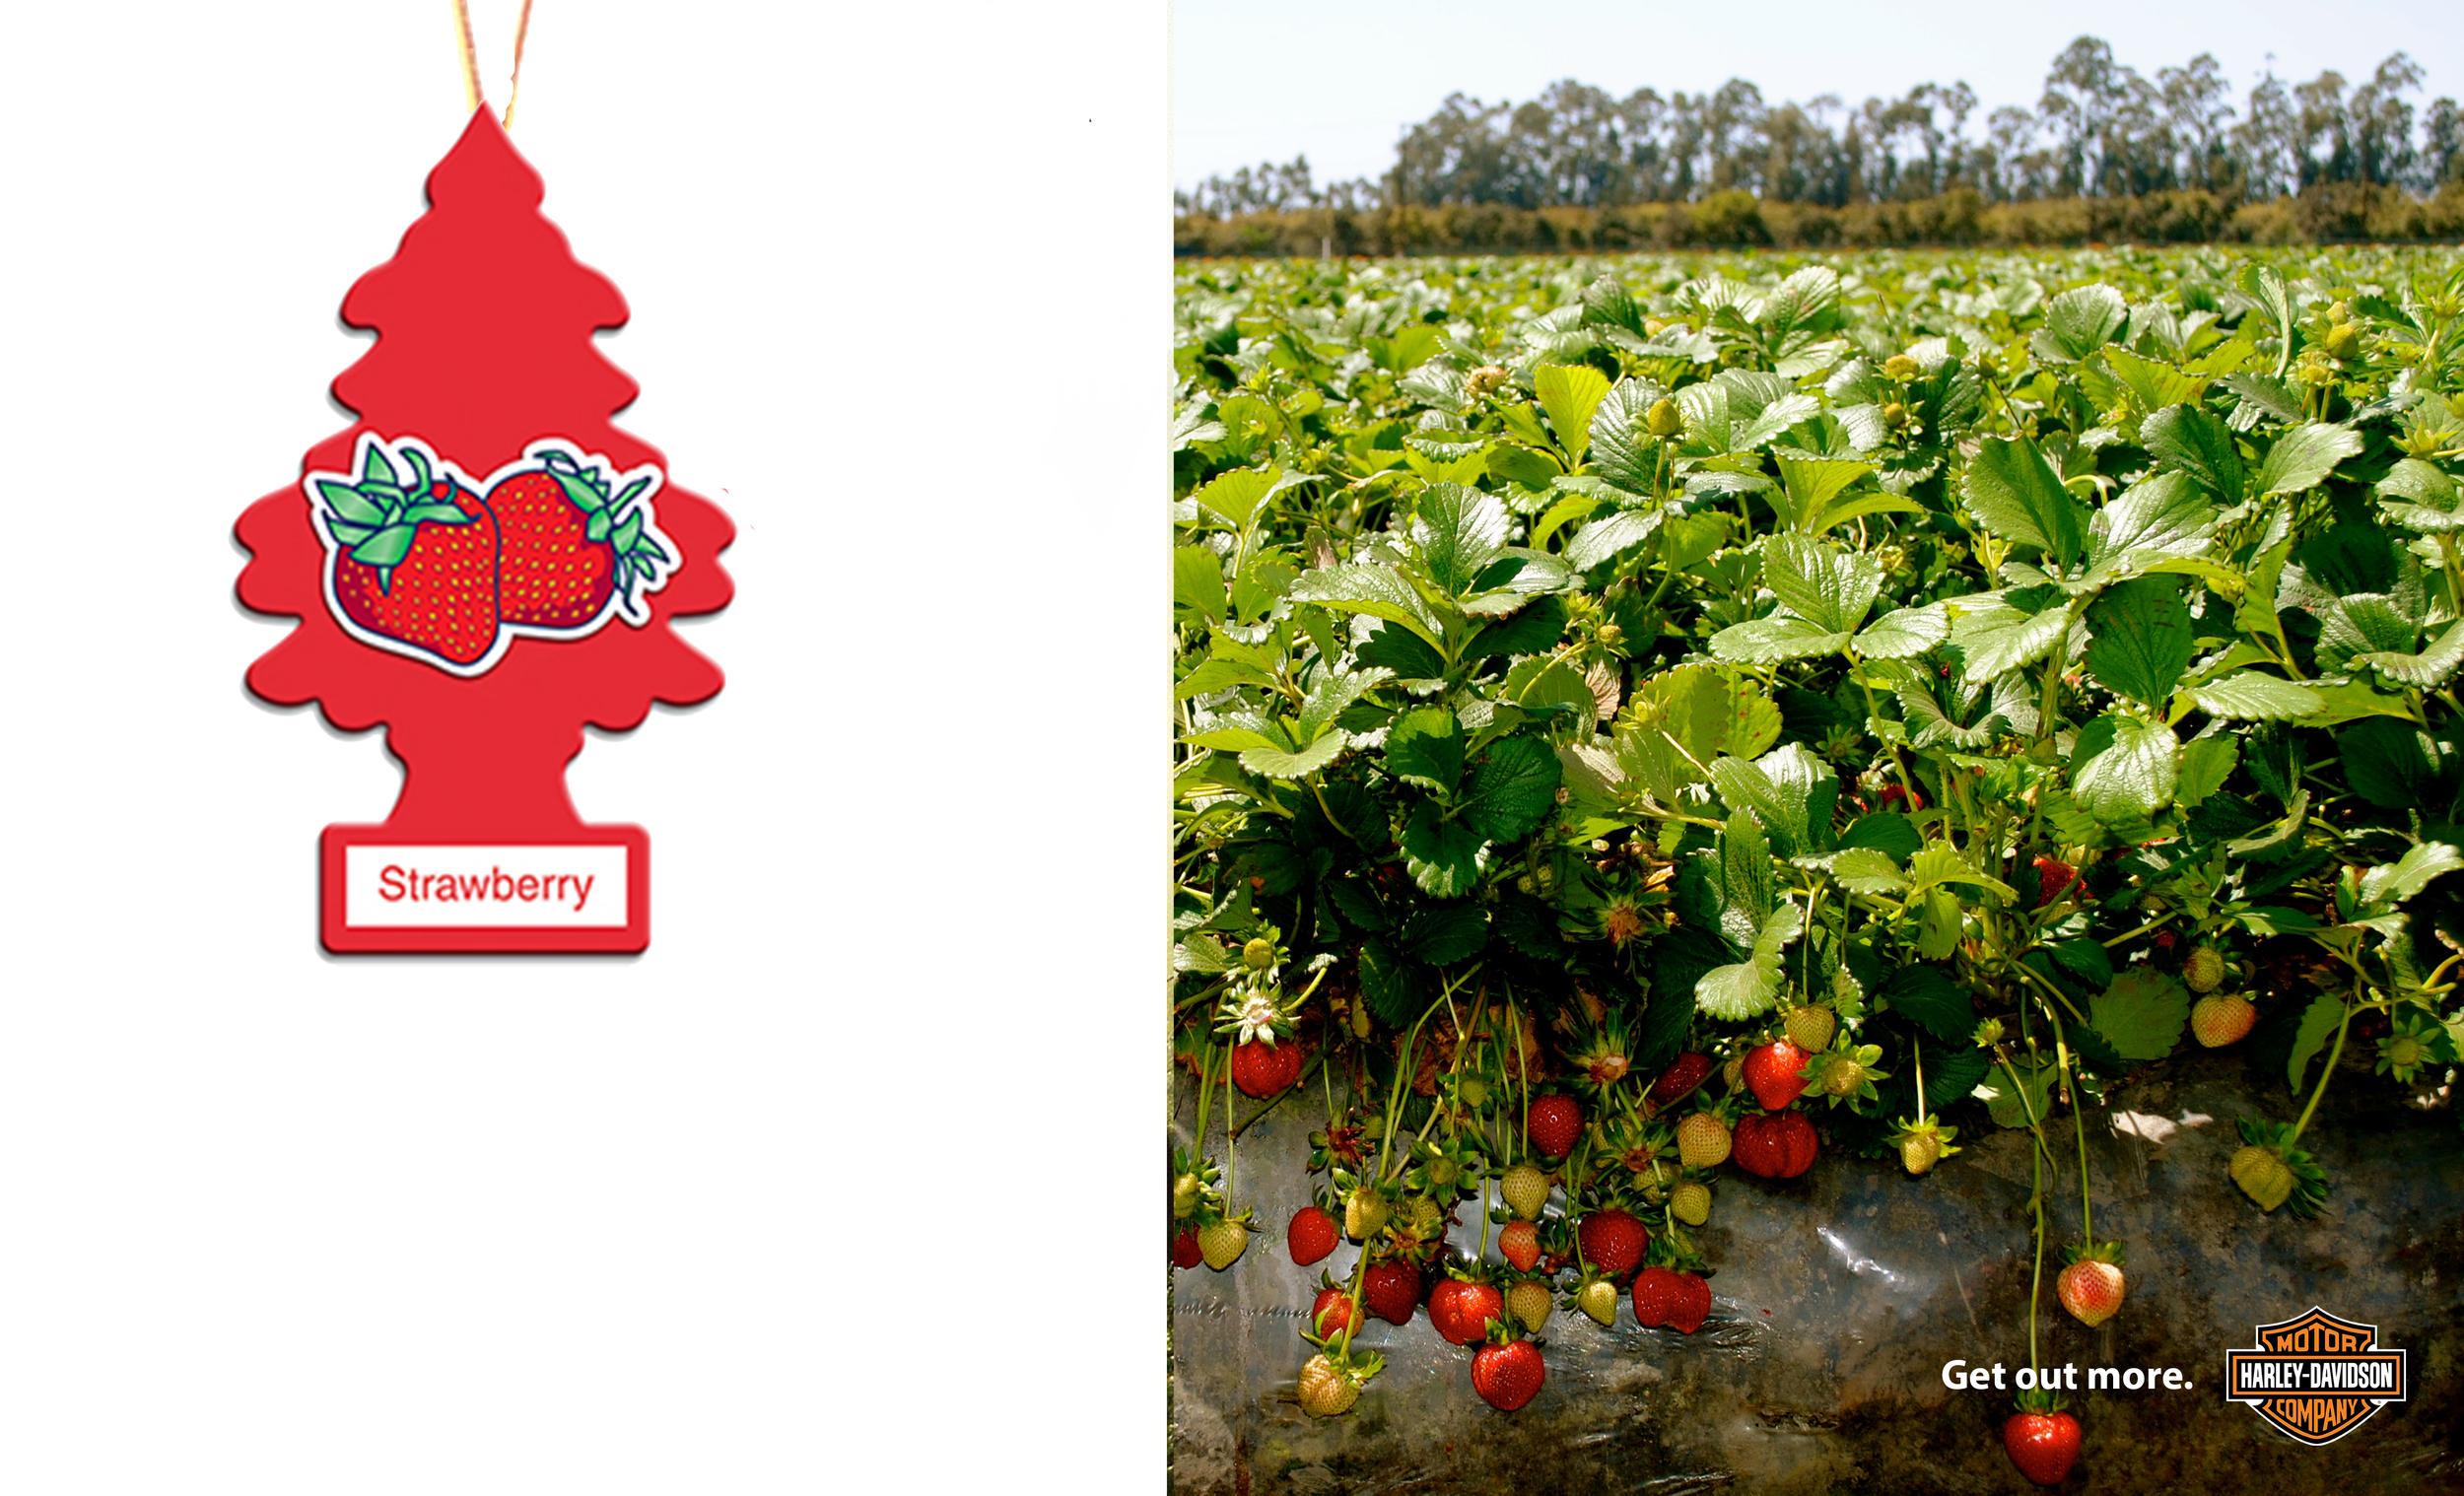 harley-getoutmore-strawberry.jpg